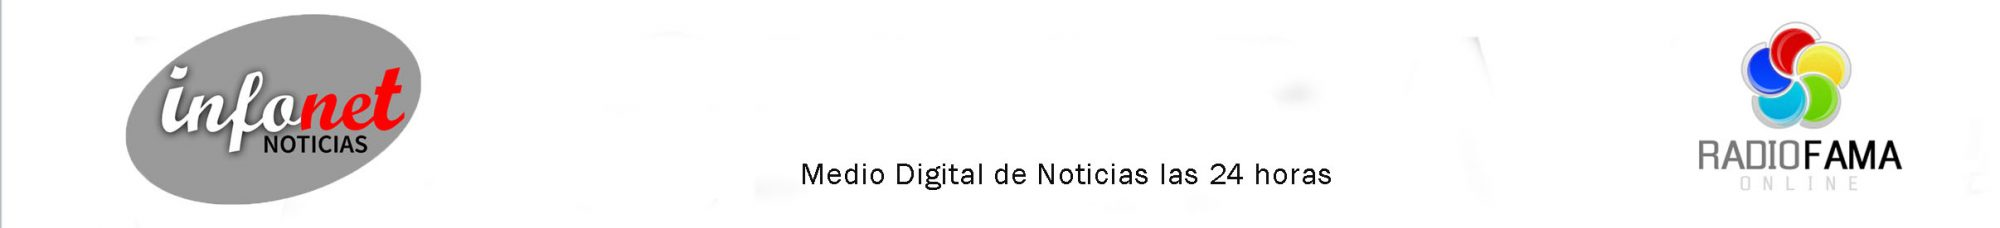 Infonet Noticias